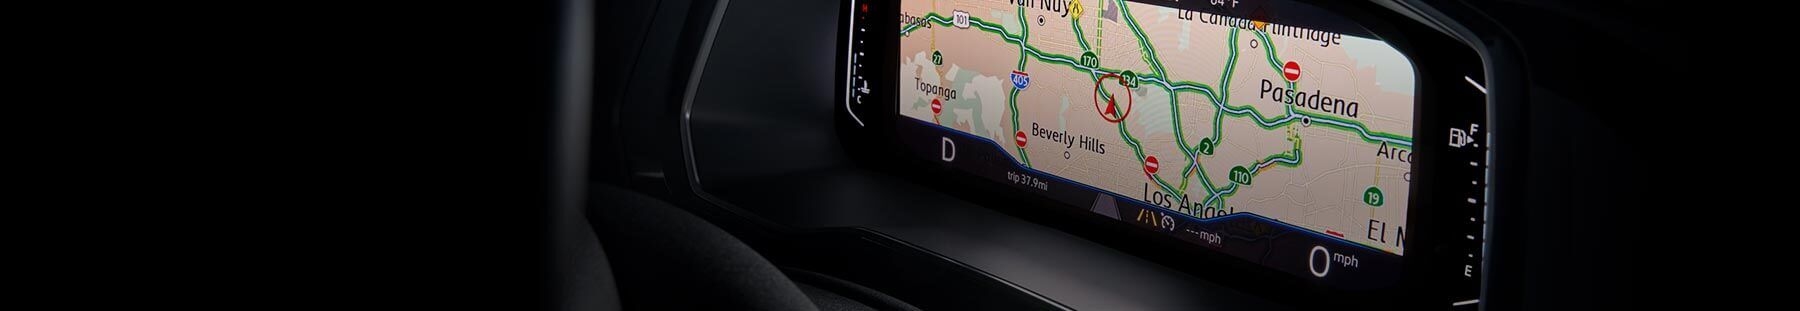 All New Volkswagen Jetta in Thousand Oaks, CA